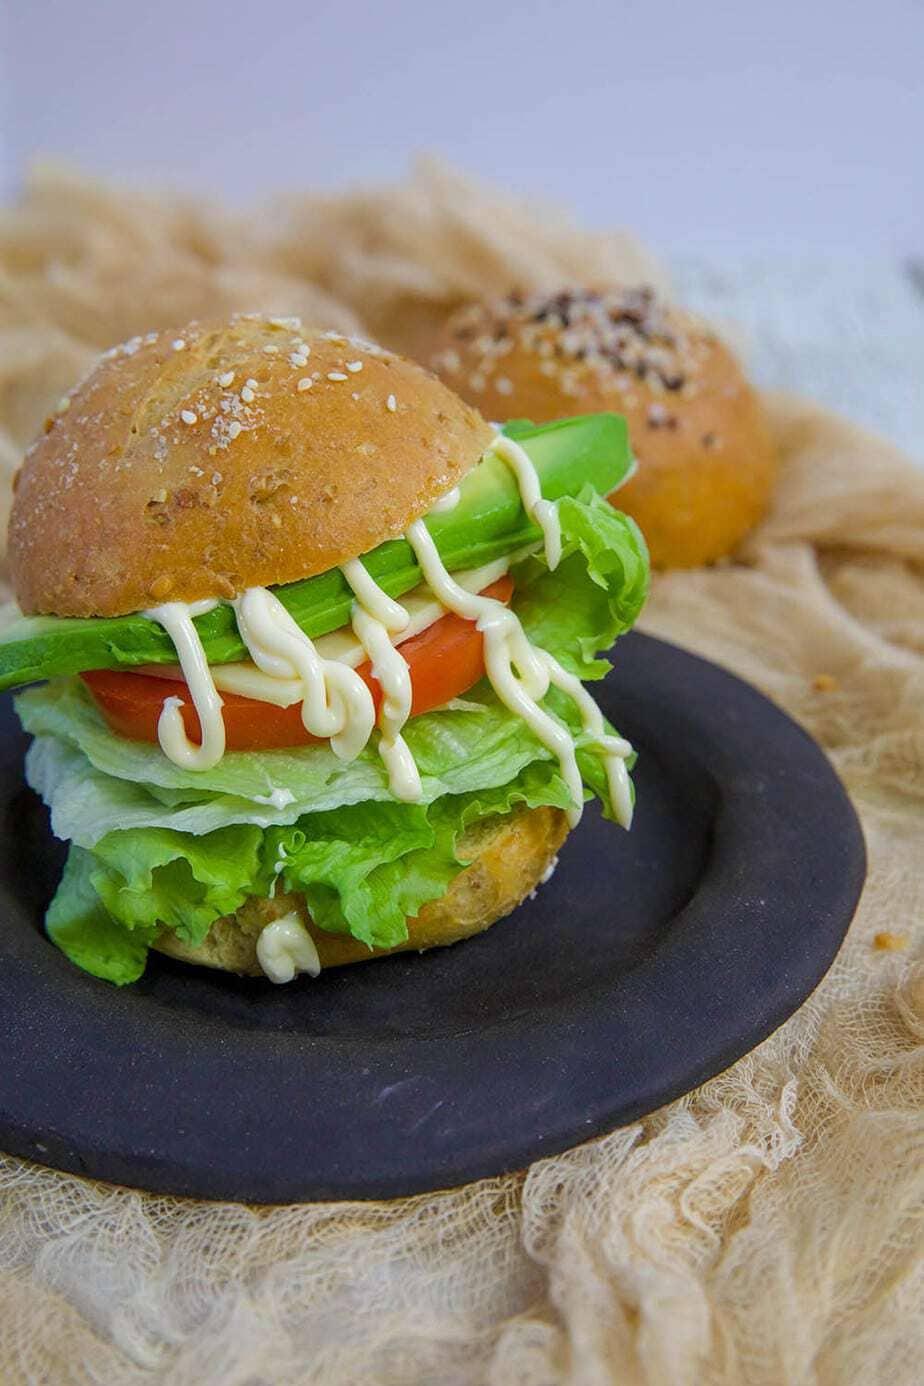 Bun with mayo and salad on a plate